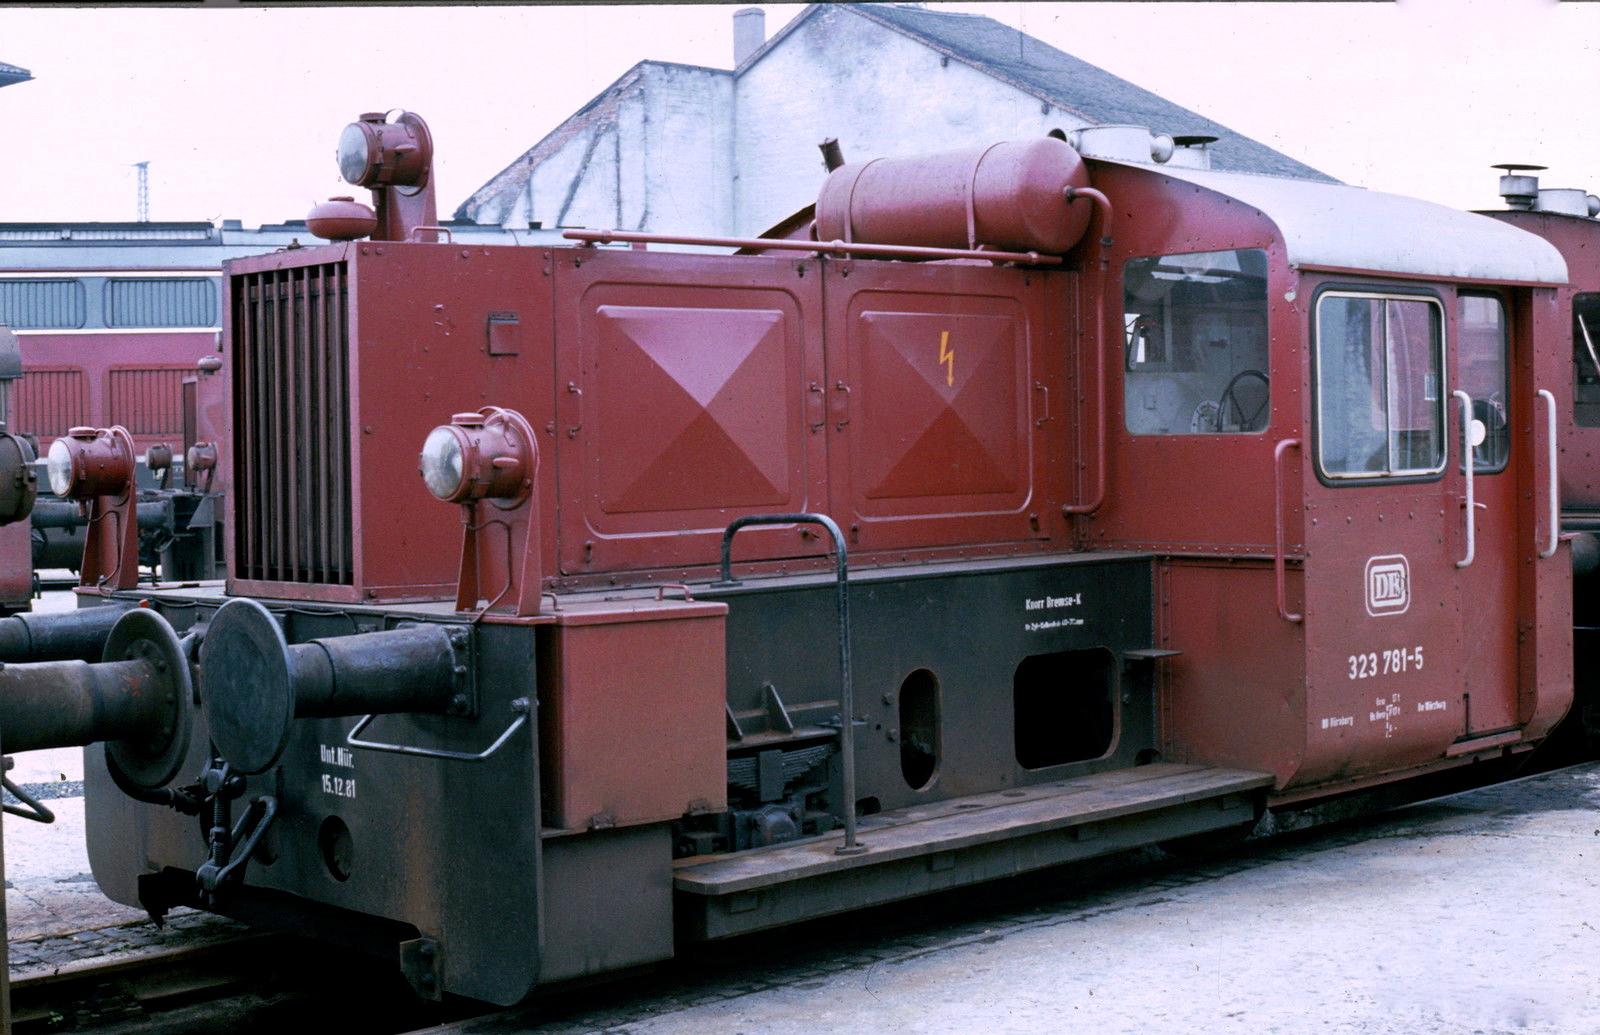 DB 323 781 Schweinfurt 1982